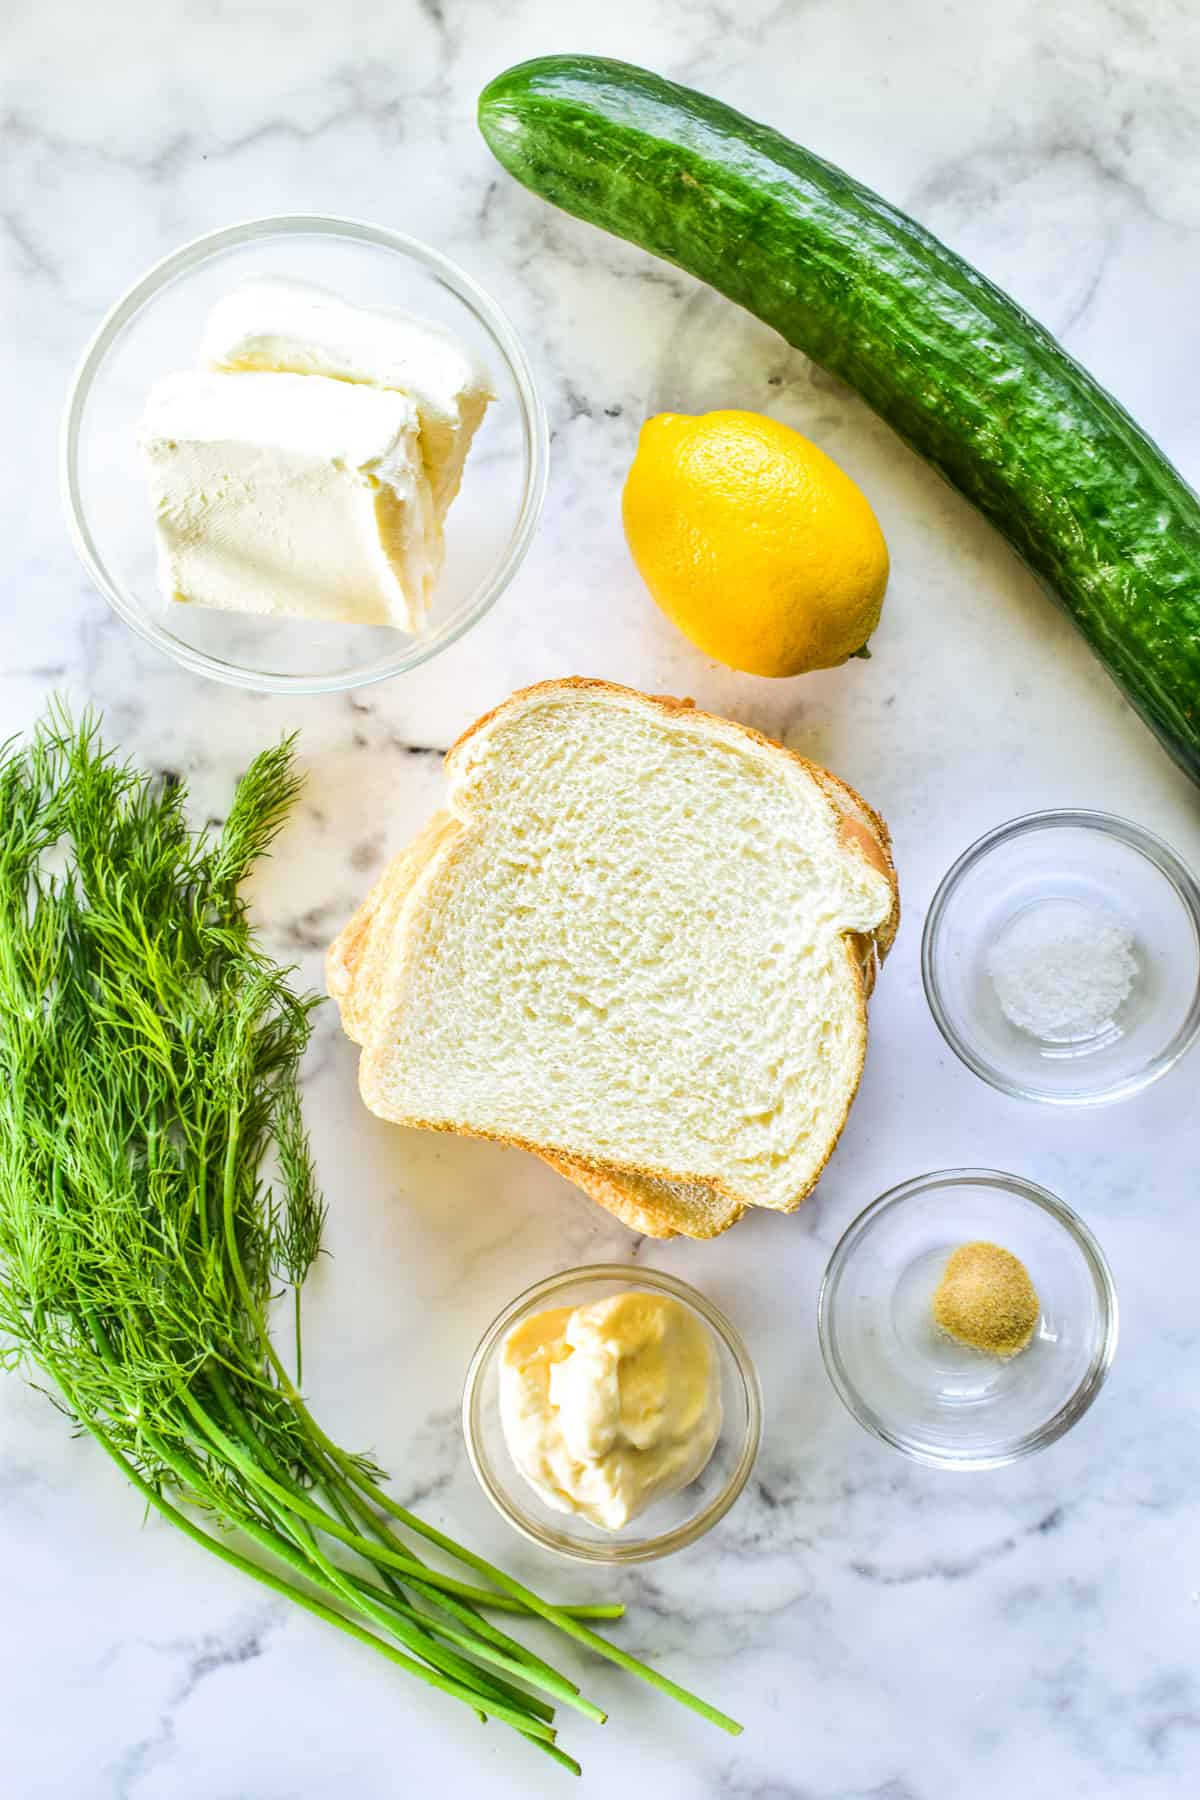 Cucumber Sandwich ingredients on a marble board